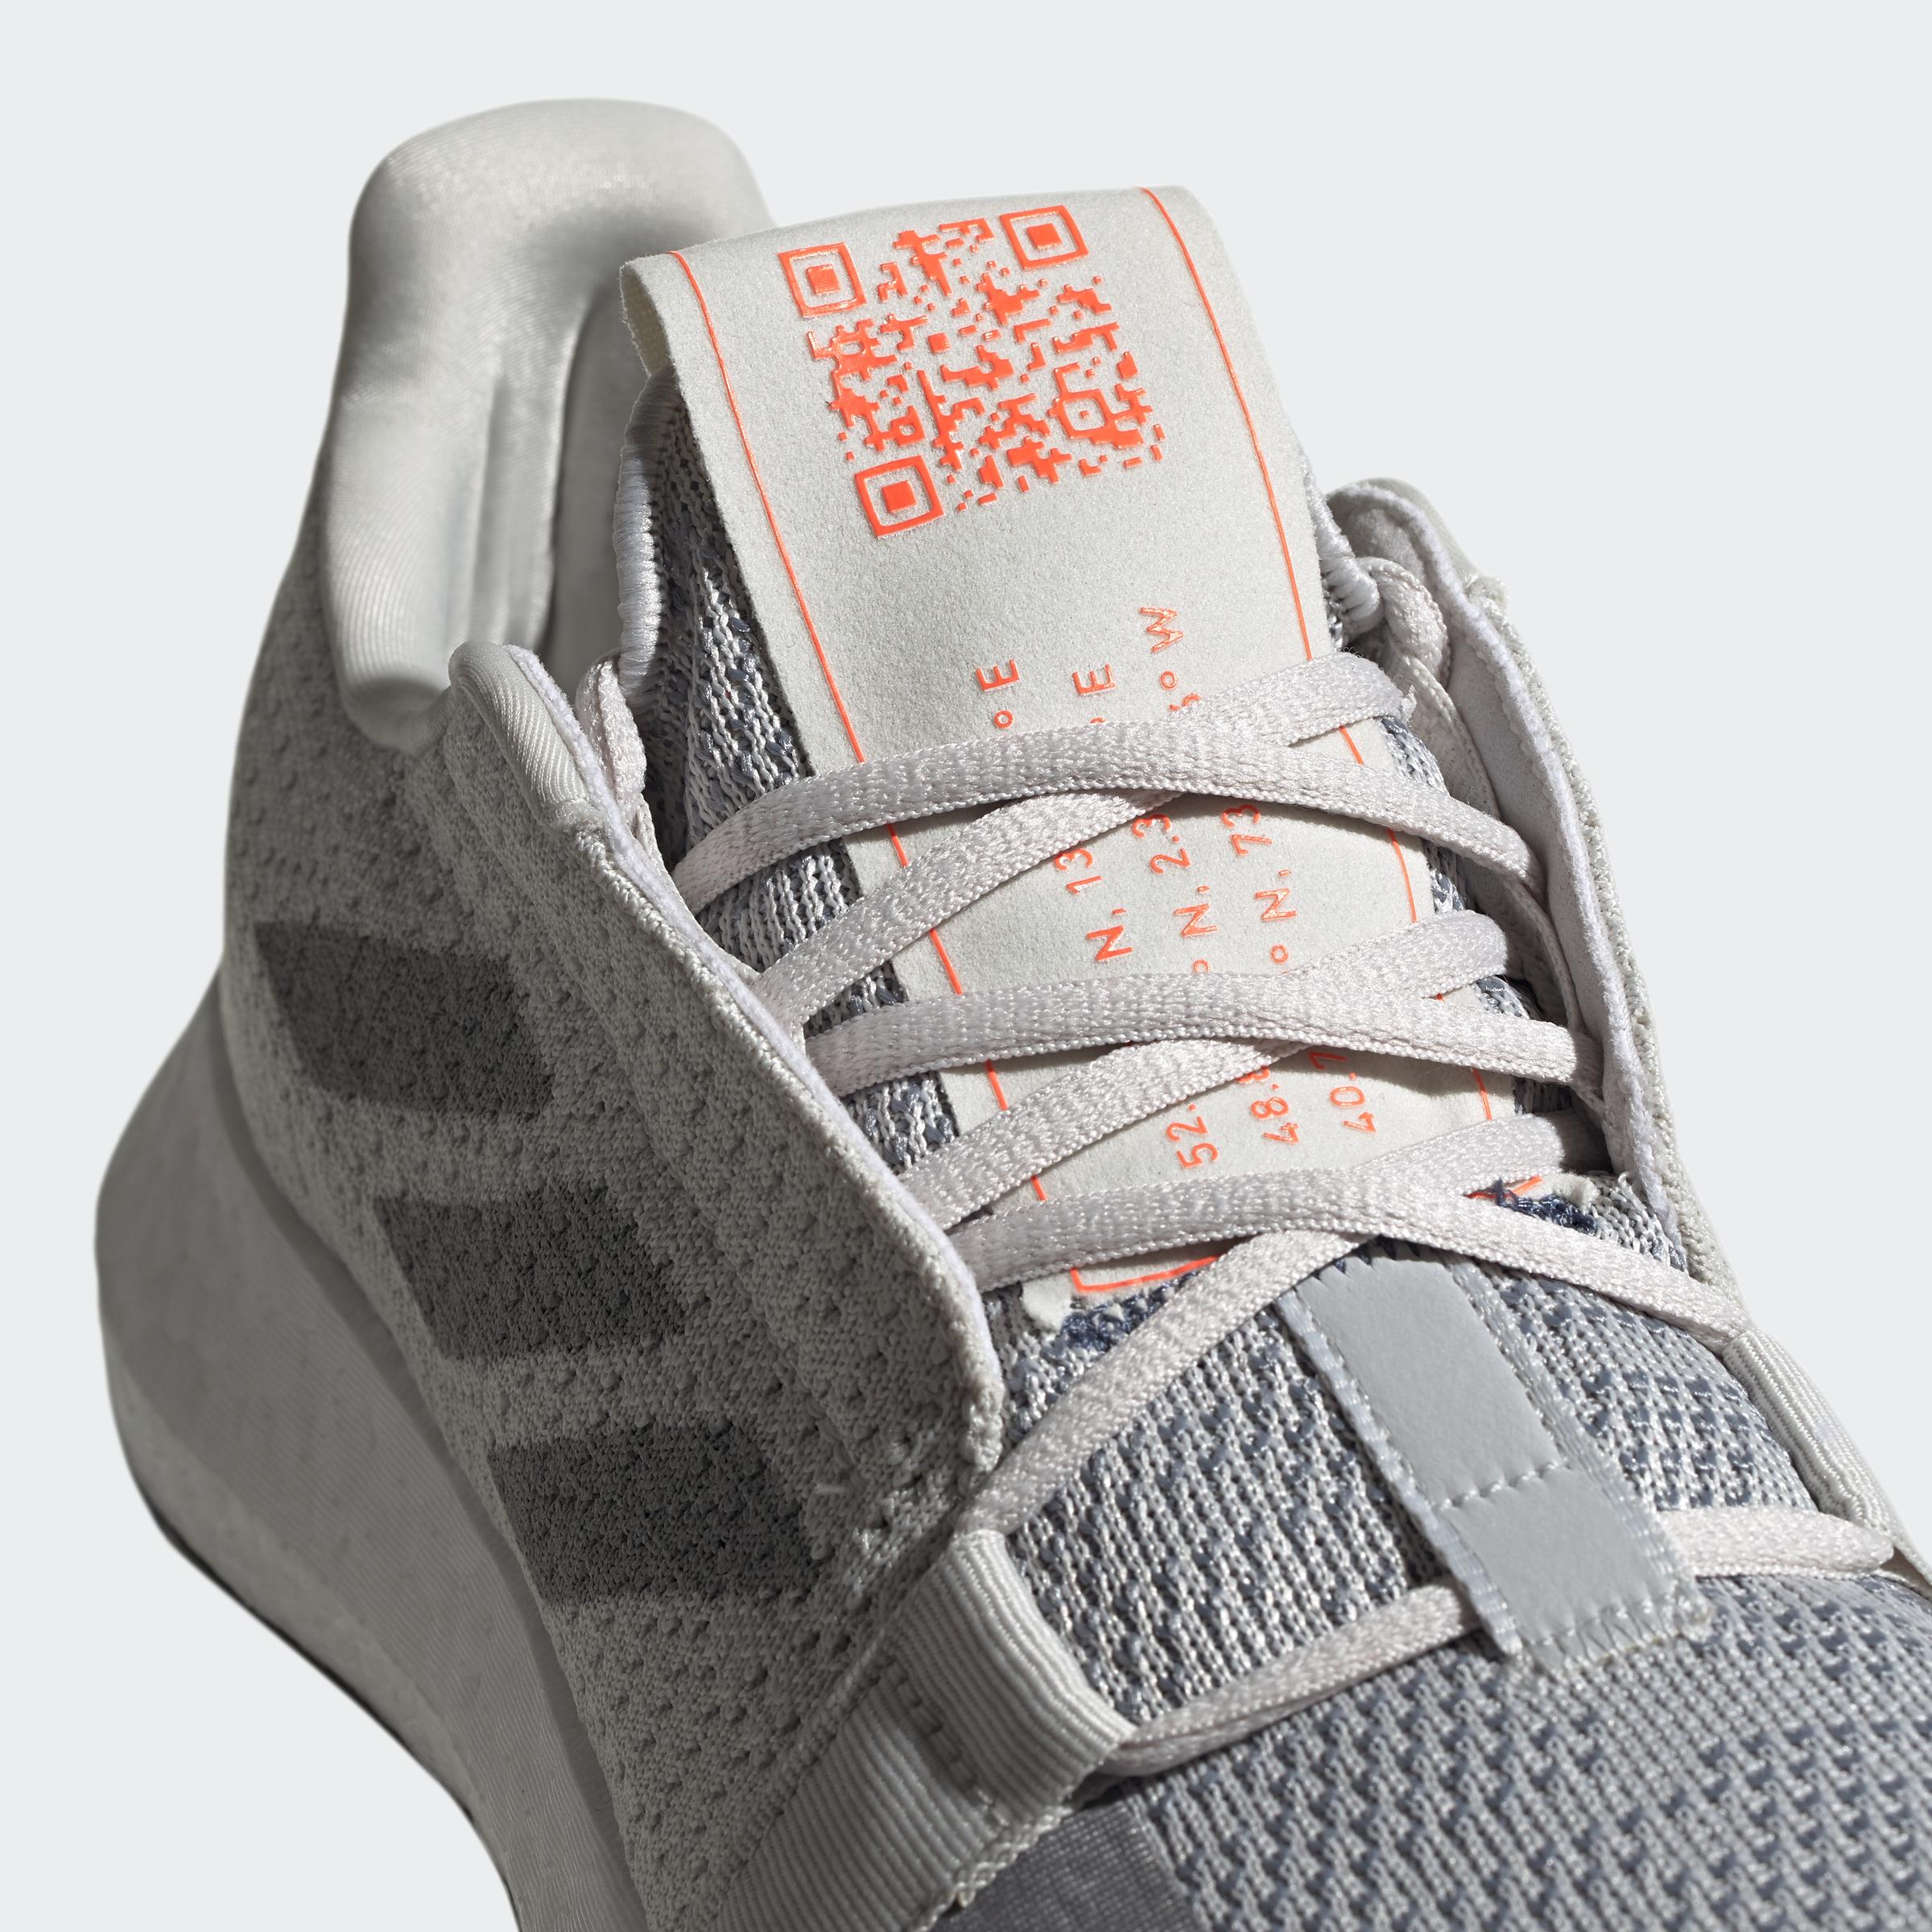 miniature 54 - adidas Senseboost Go Shoes Men's Athletic & Sneakers